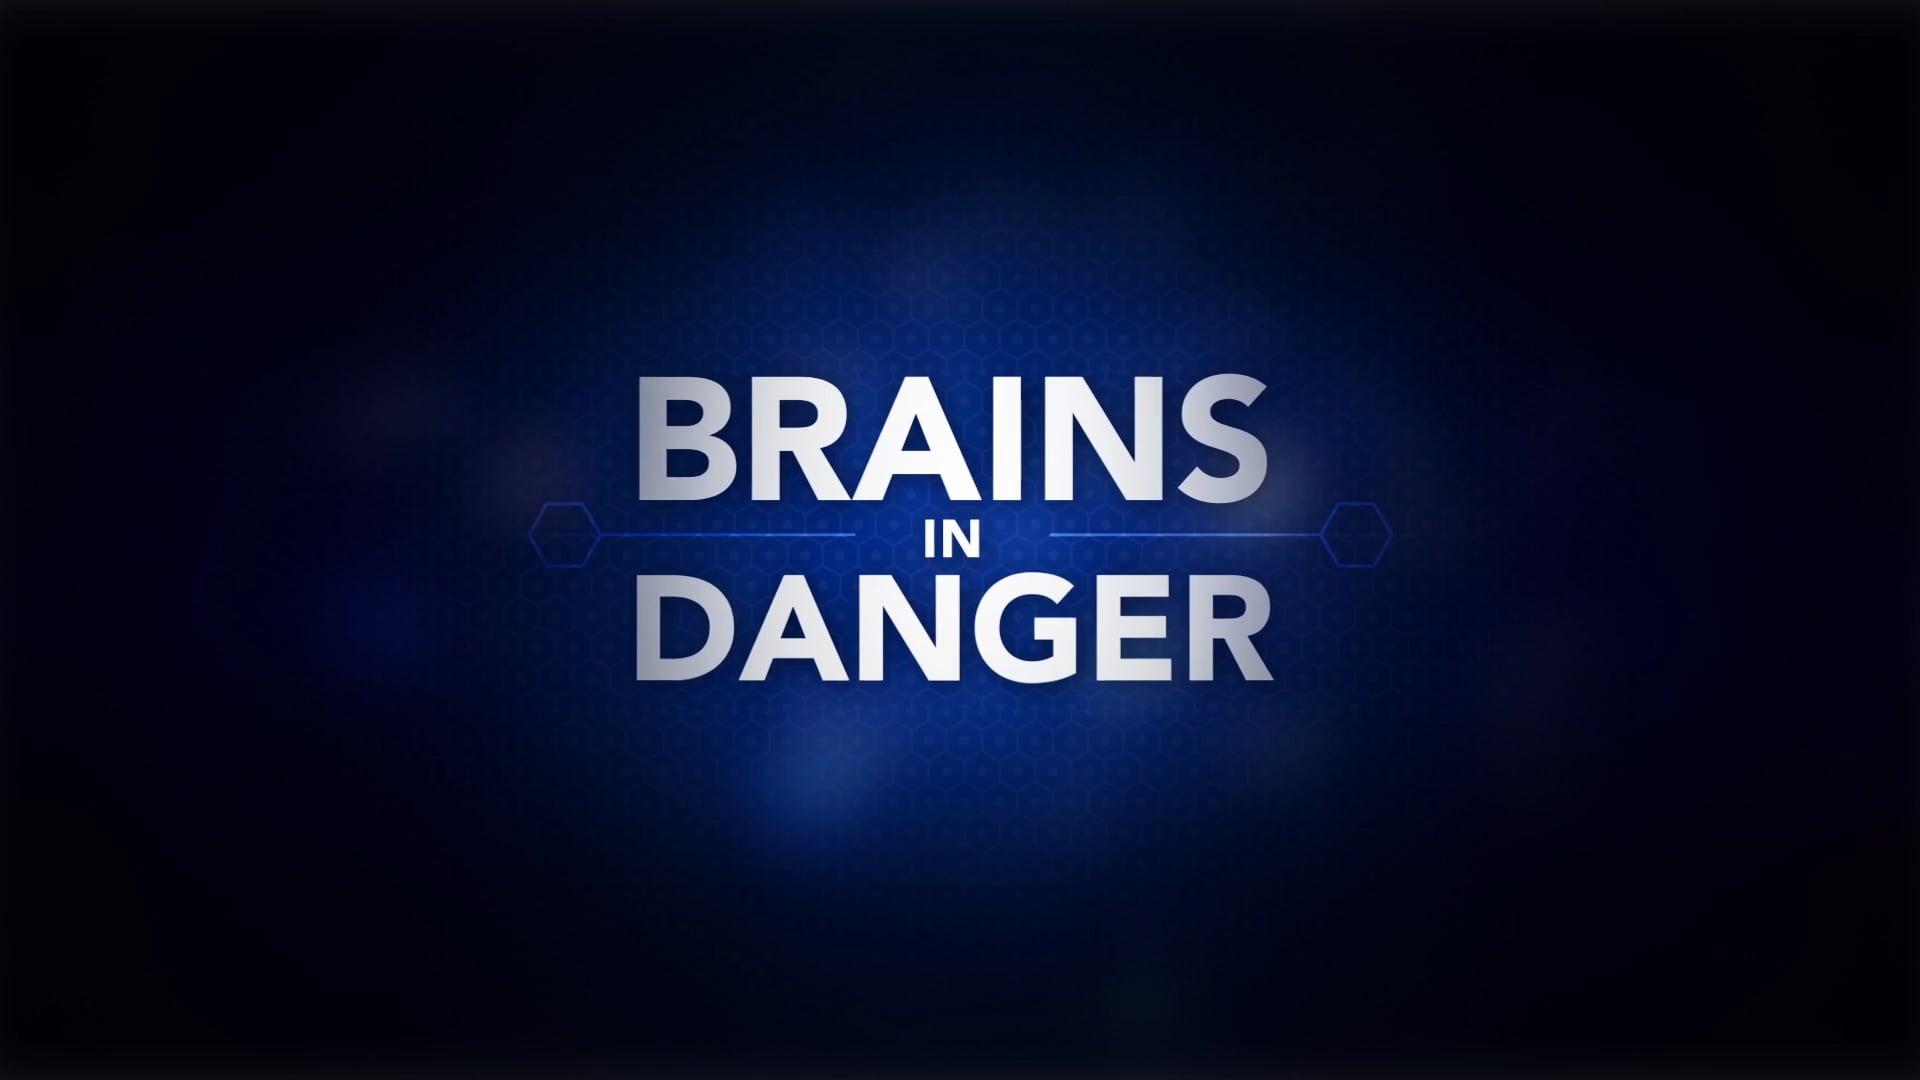 BRAINS IN DANGER